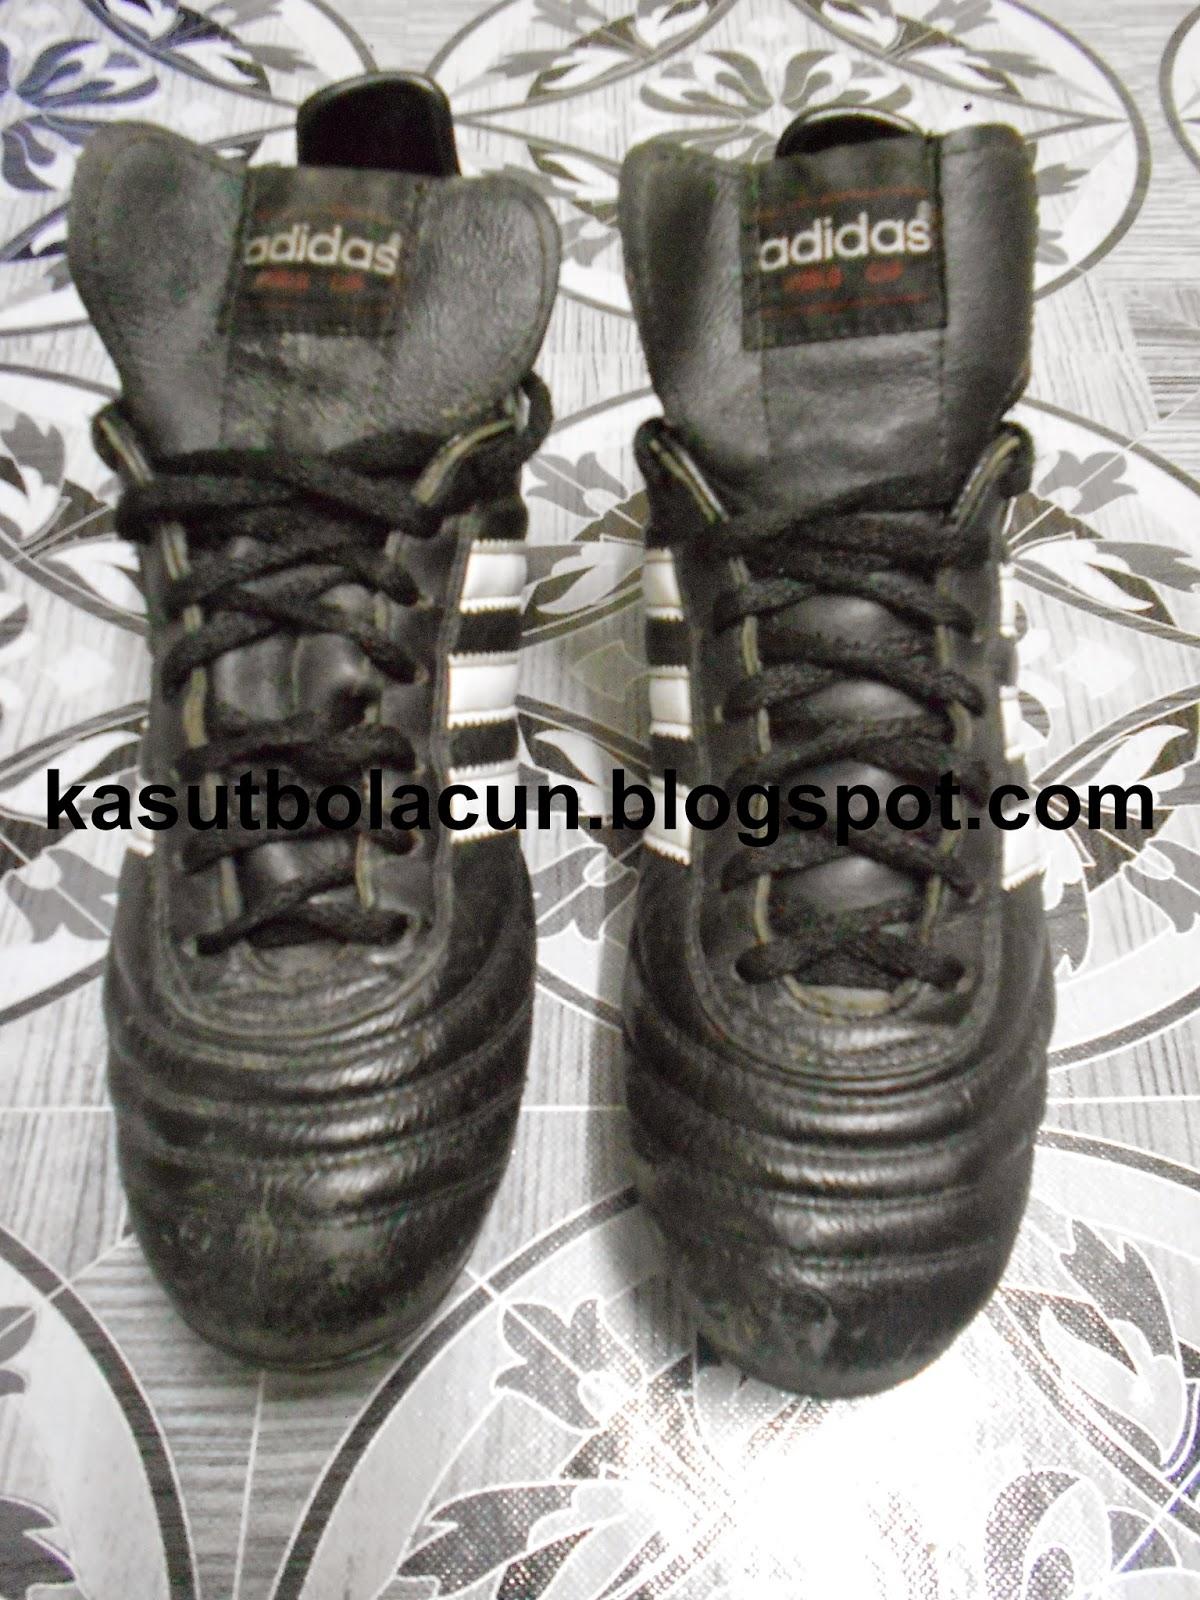 http://kasutbolacun.blogspot.com/2014/10/adidas-world-cup_18.html